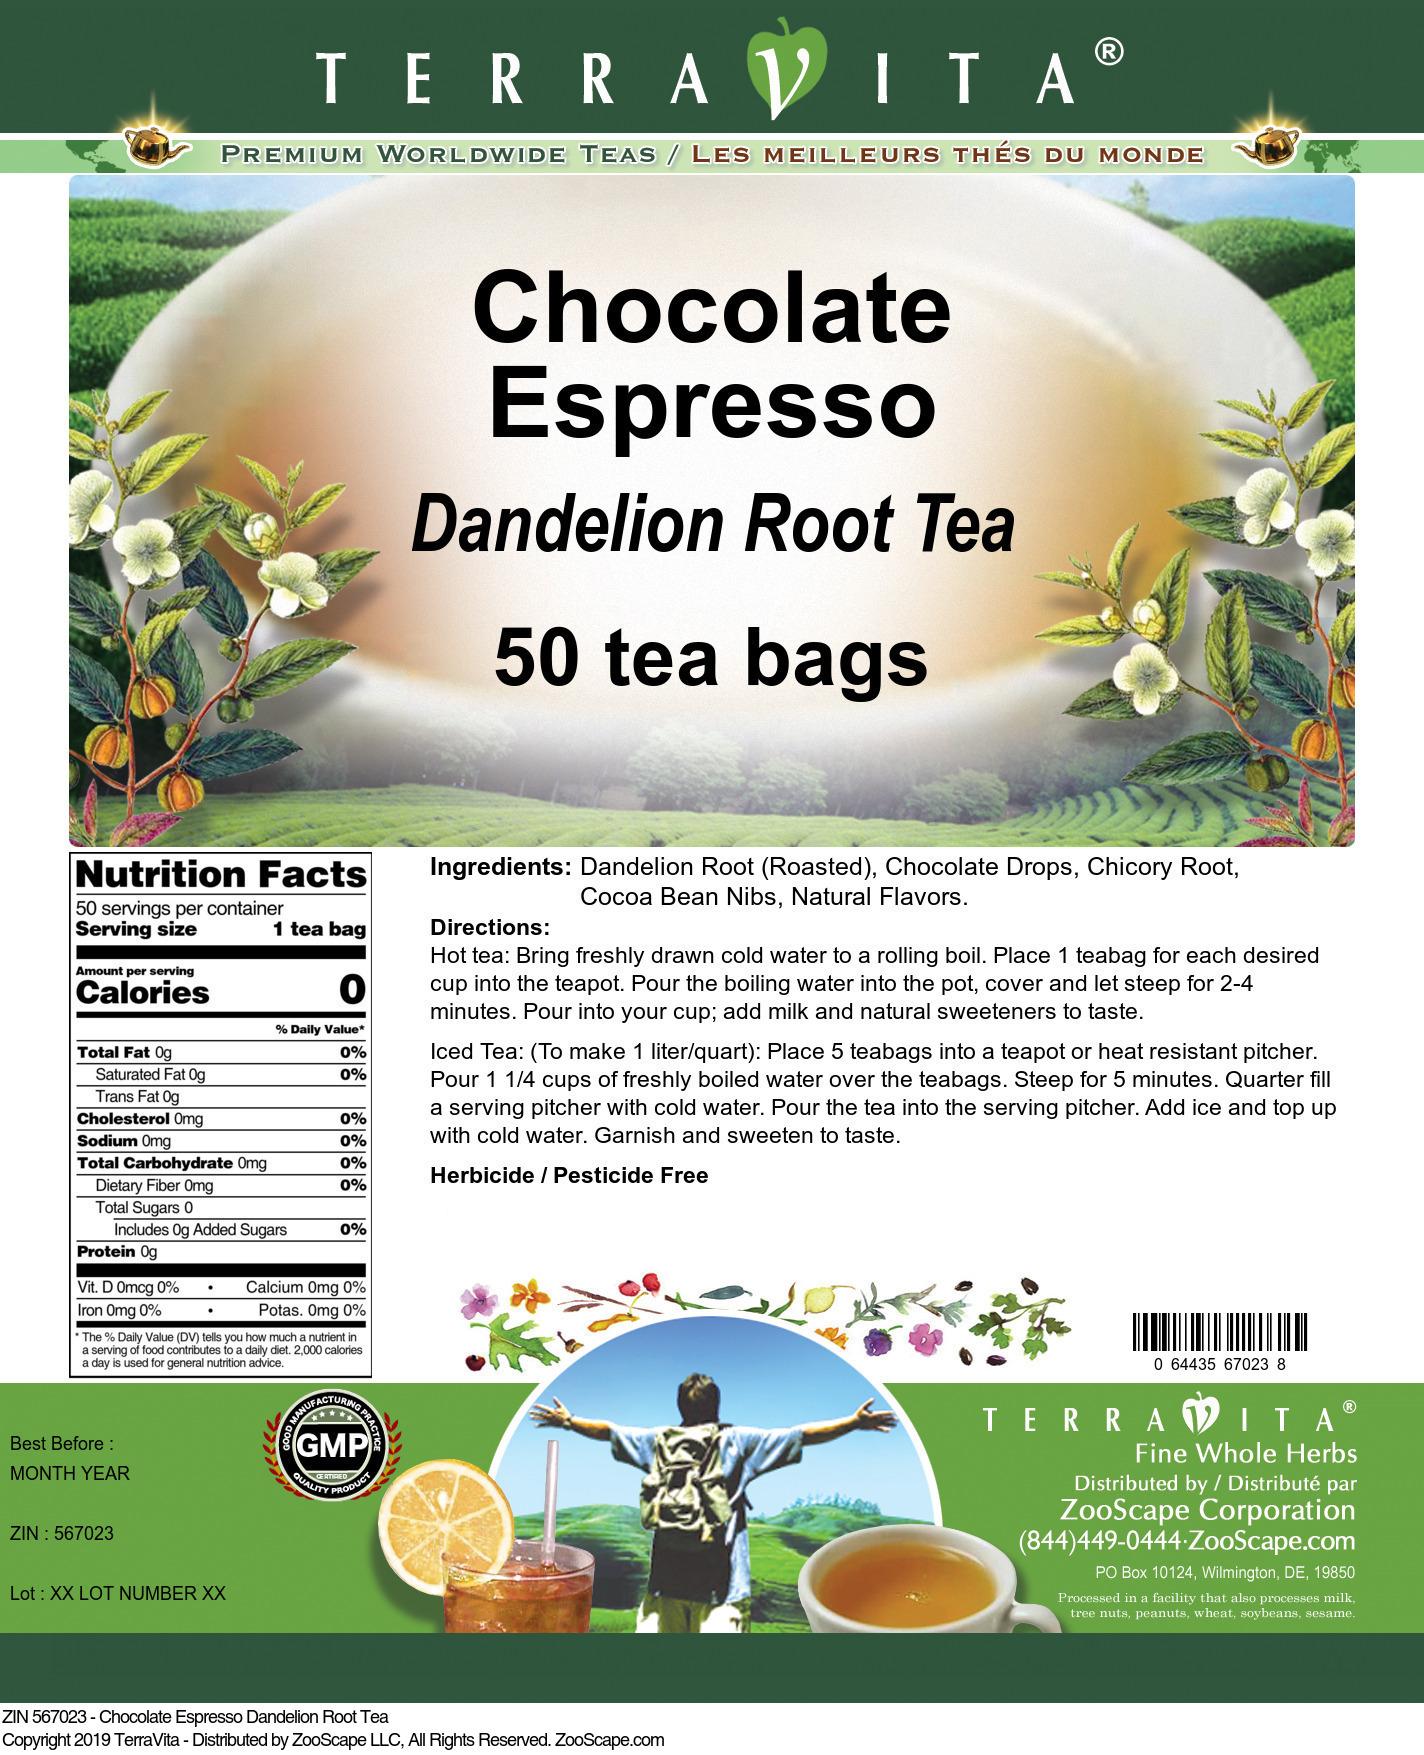 Chocolate Espresso Dandelion Root